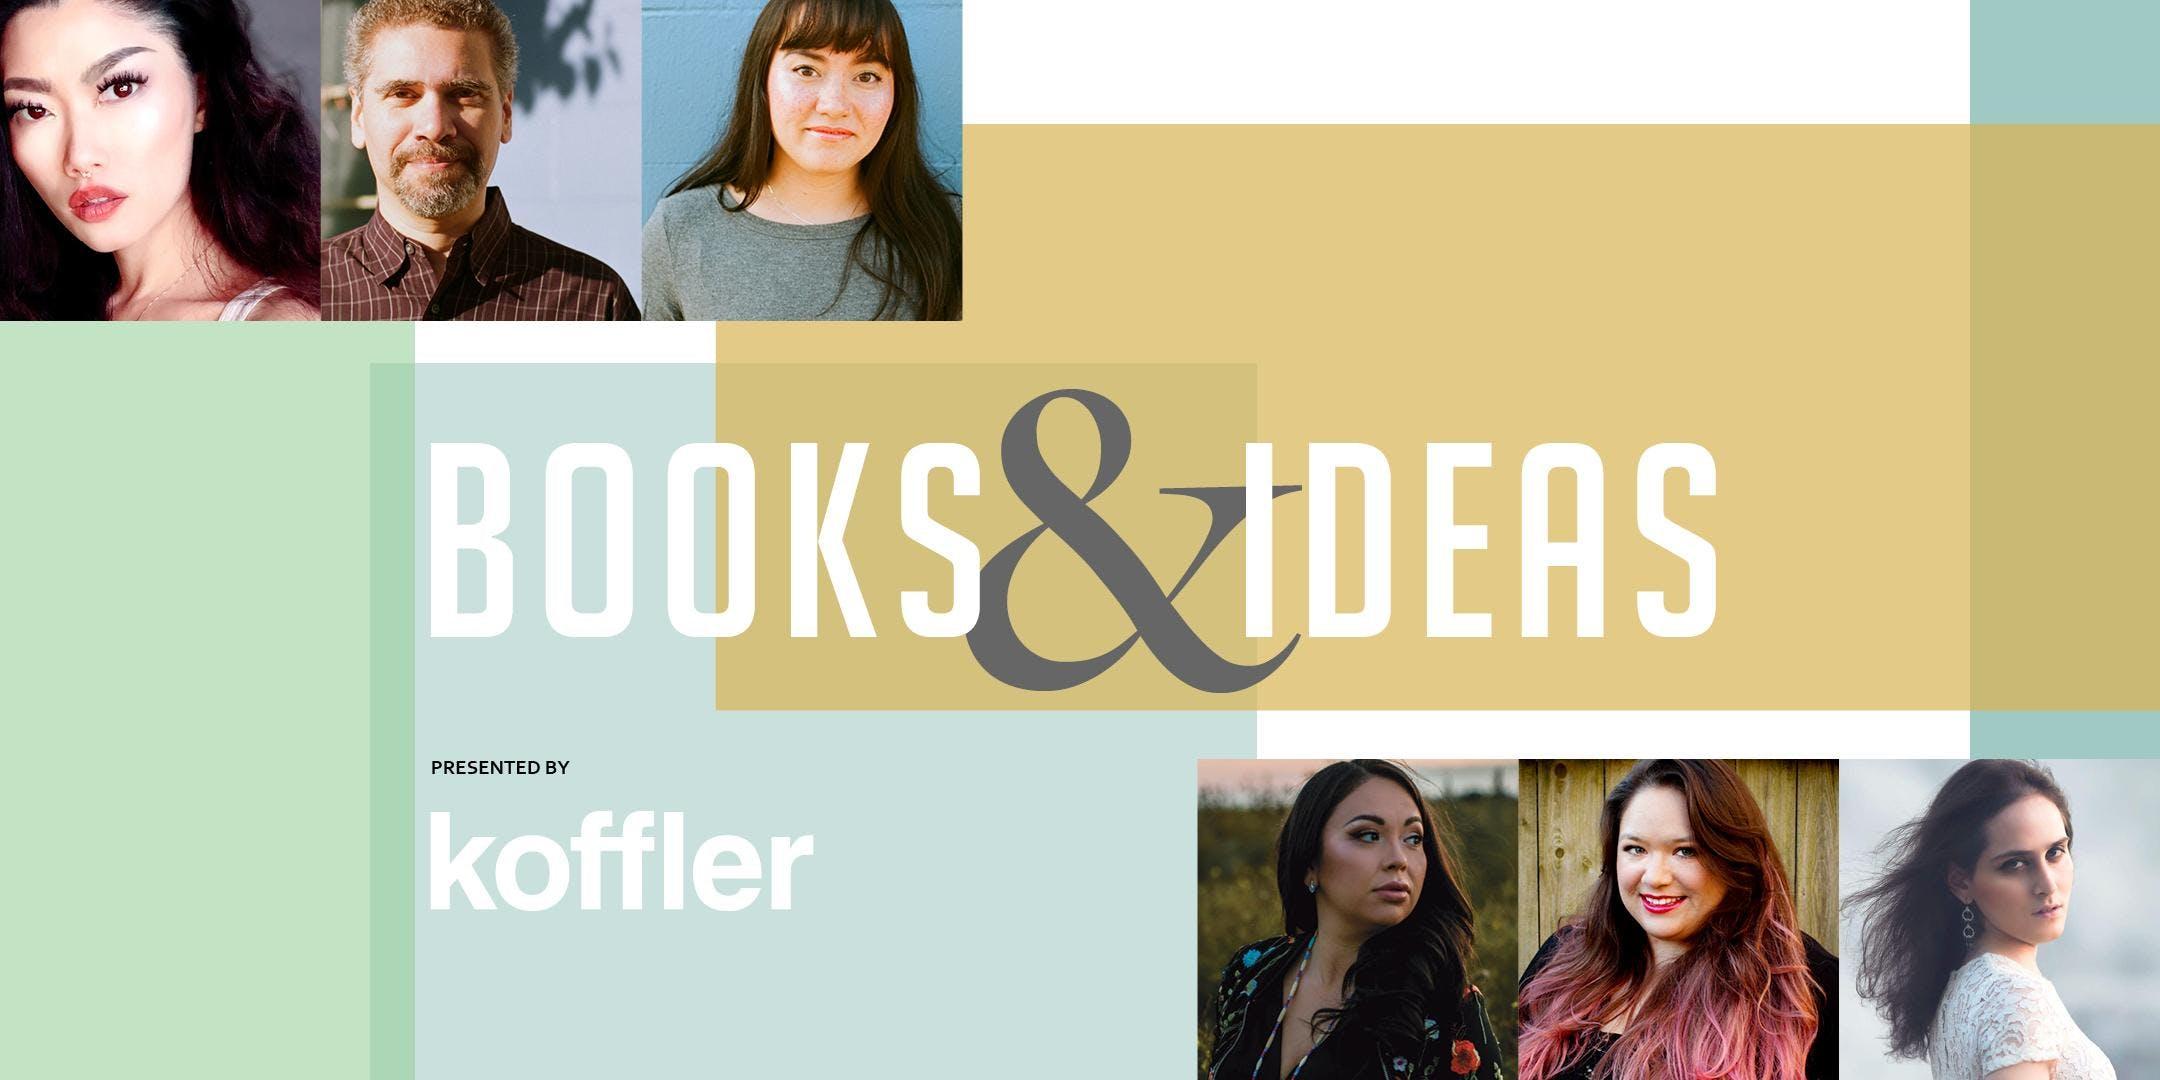 Books & Ideas Fall 2019 Series